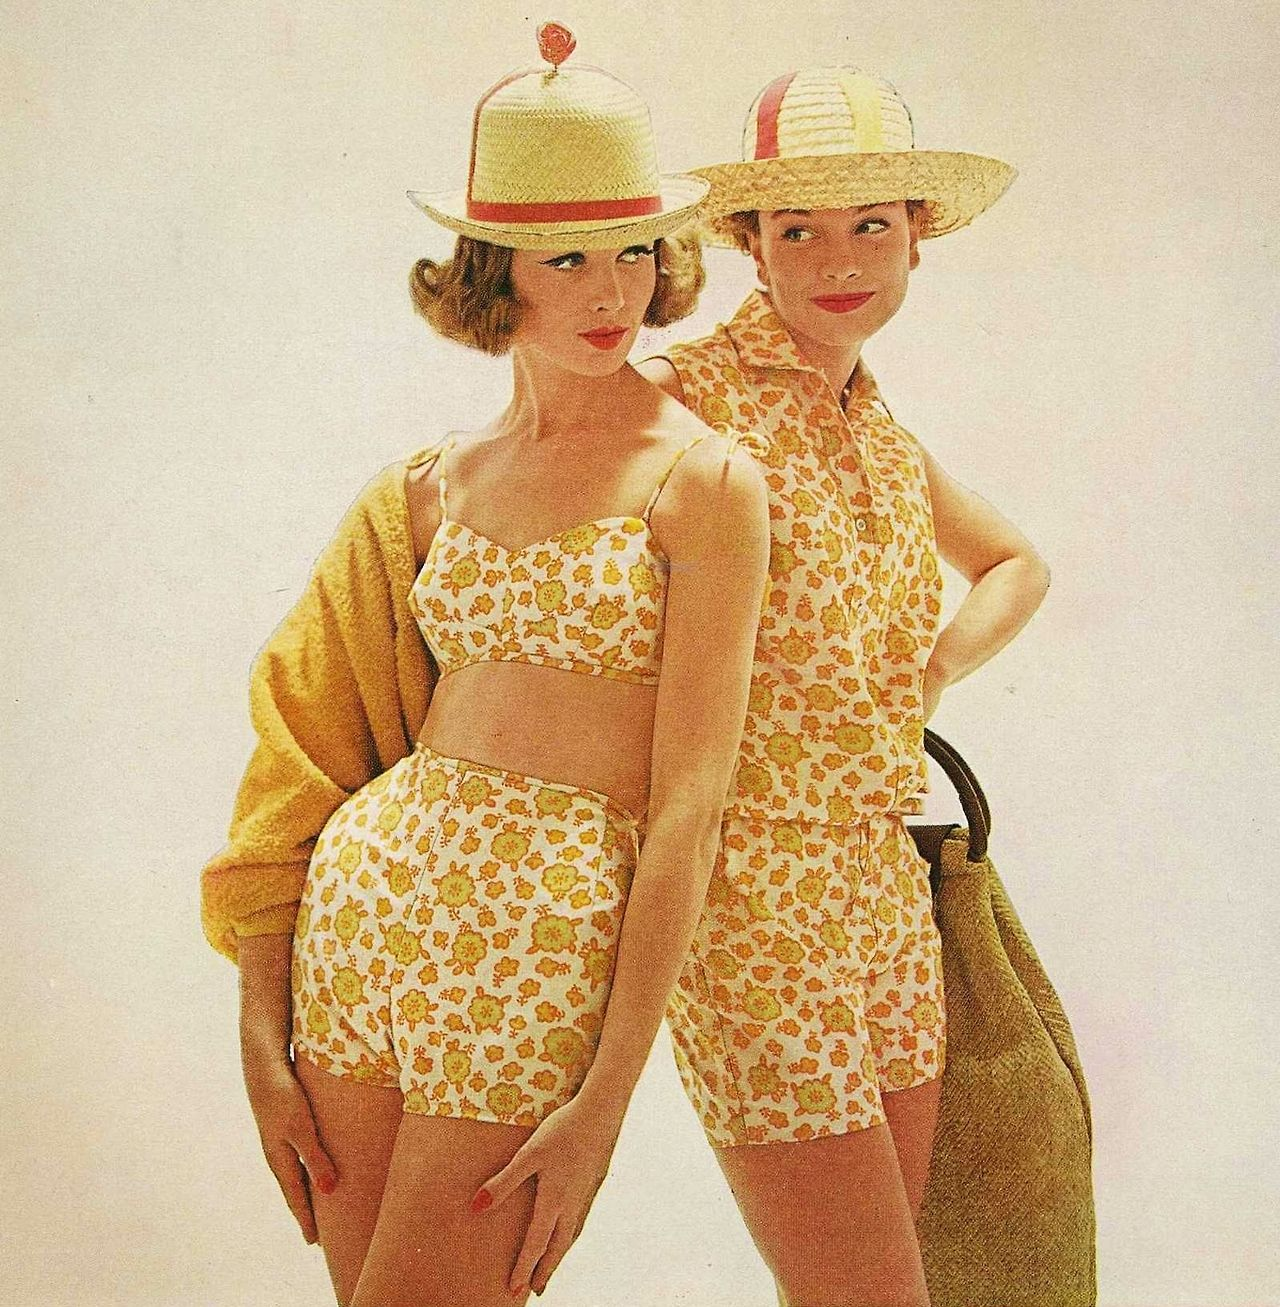 e261967bc7 60sfashionandbeauty  White Stag swimwear advertisement